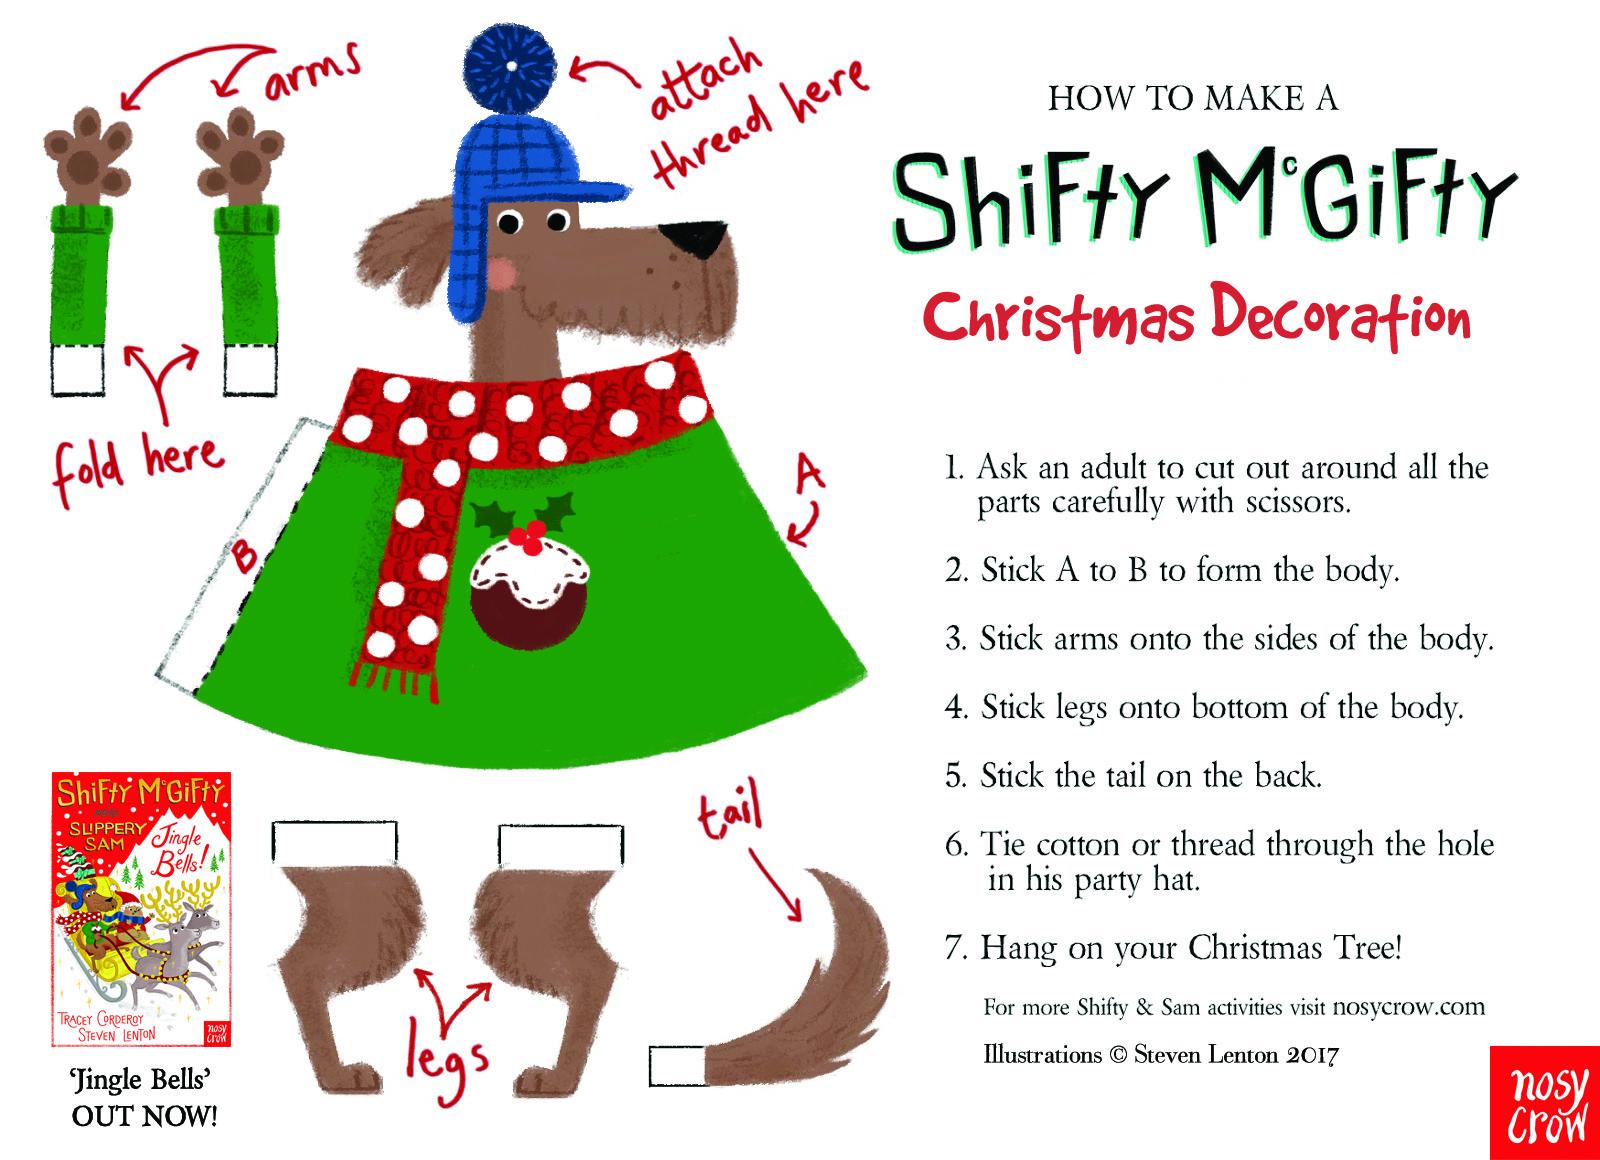 Shifty-Christmas-Decoration-Jingle-Bells-Edition_1600.jpg